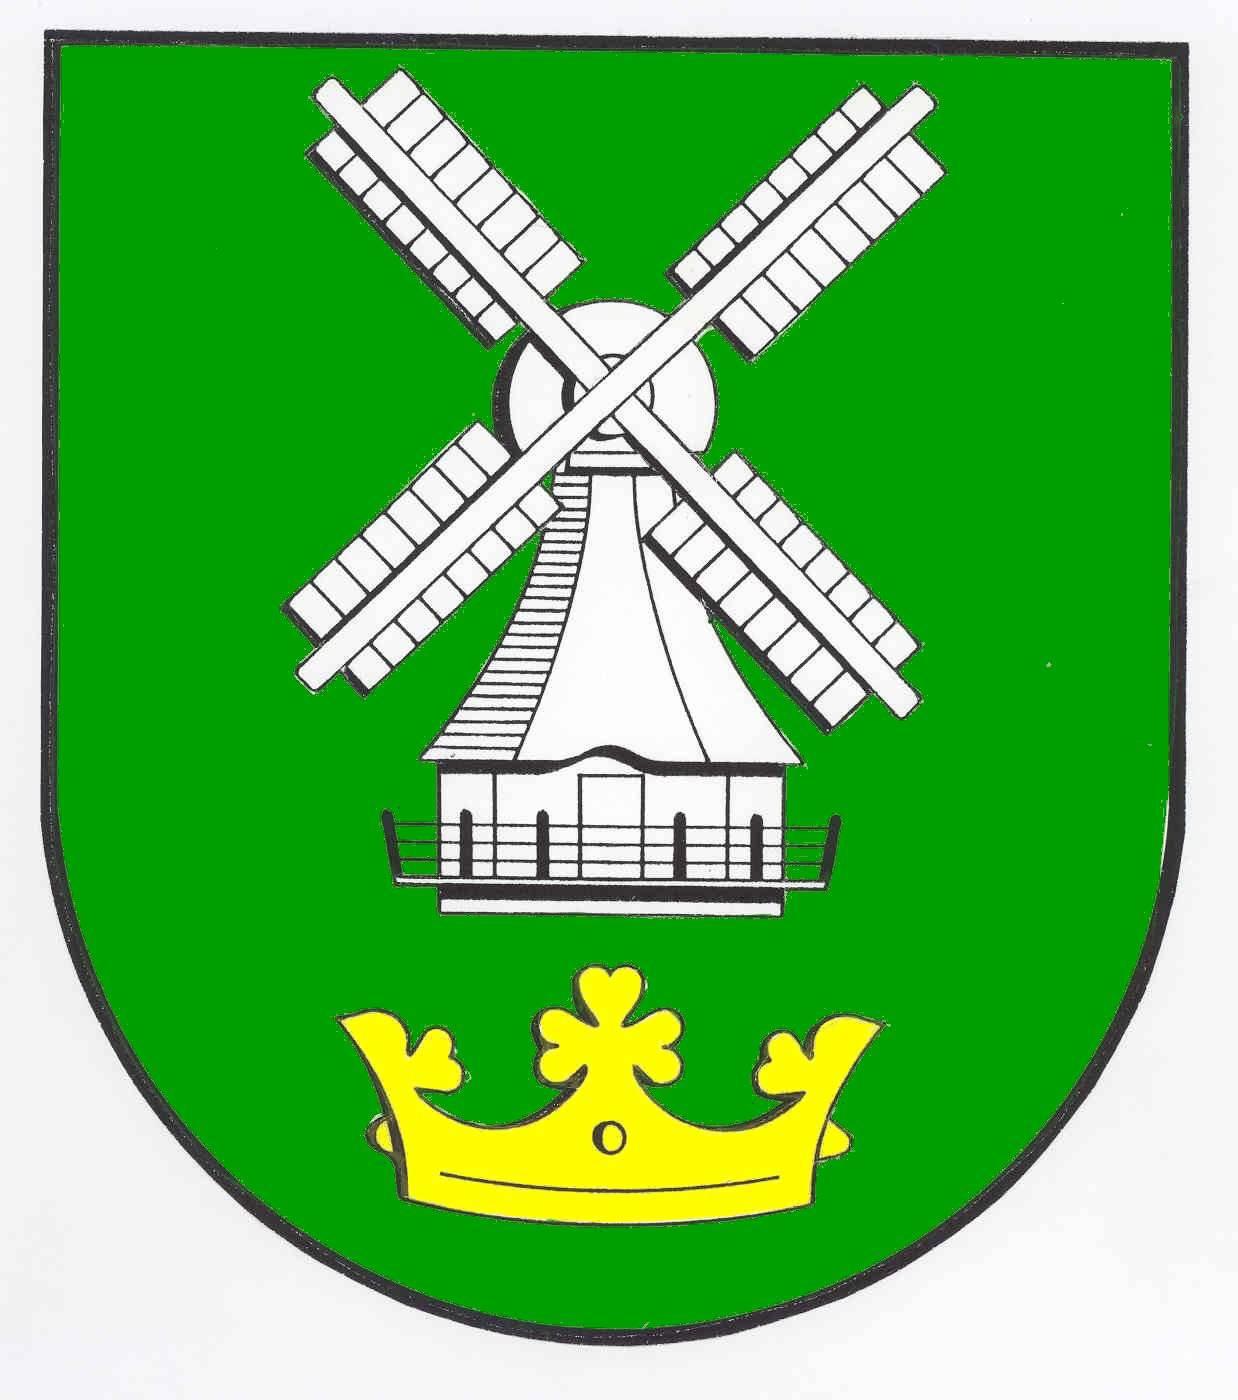 Wappen GemeindeEddelak, Kreis Dithmarschen